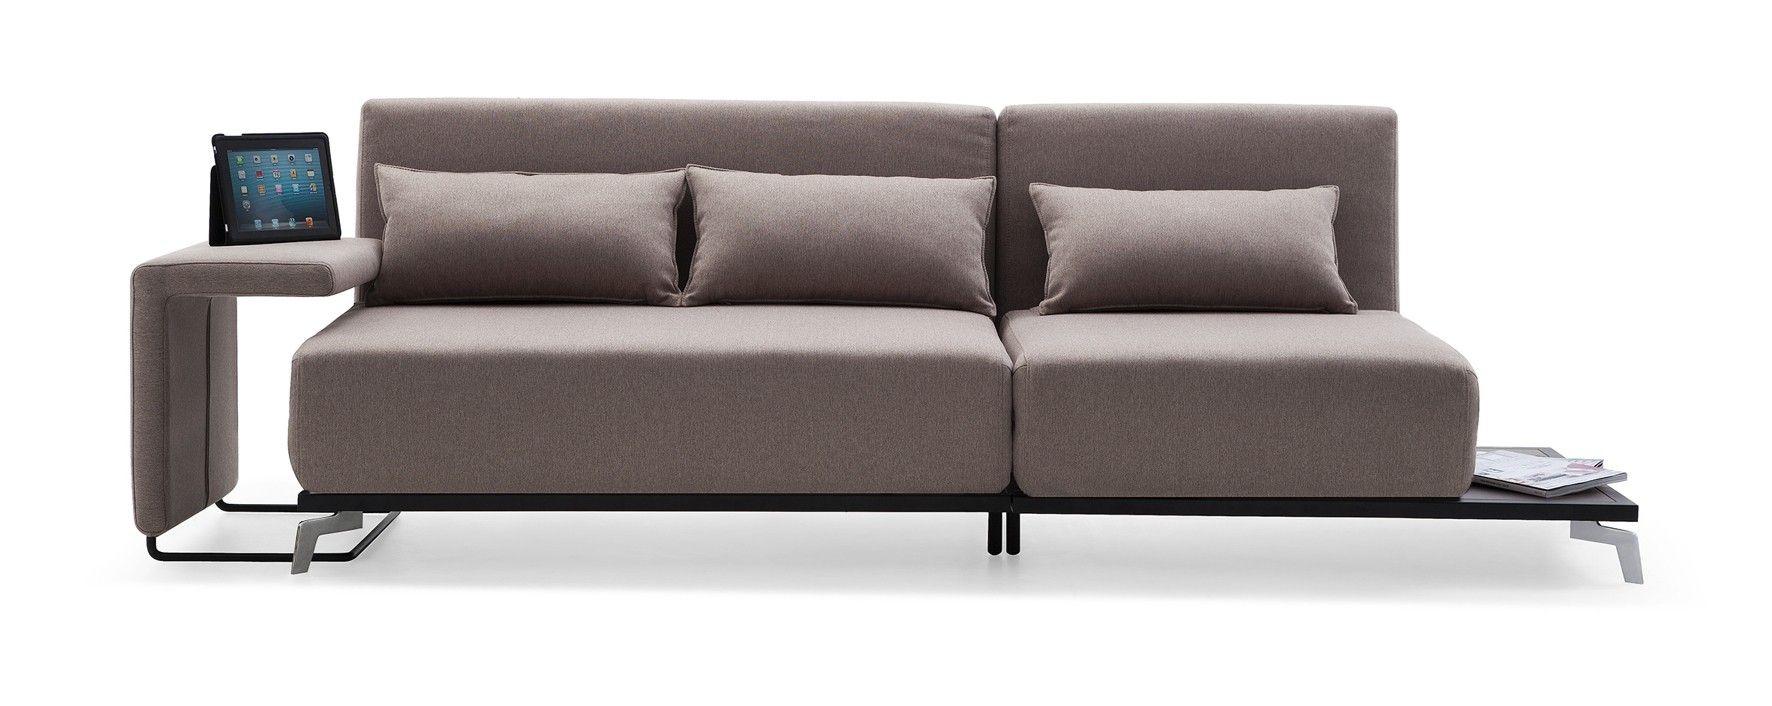 Cado Modern Furniture Jh033 Modern Sofa Bed Modern Furniture